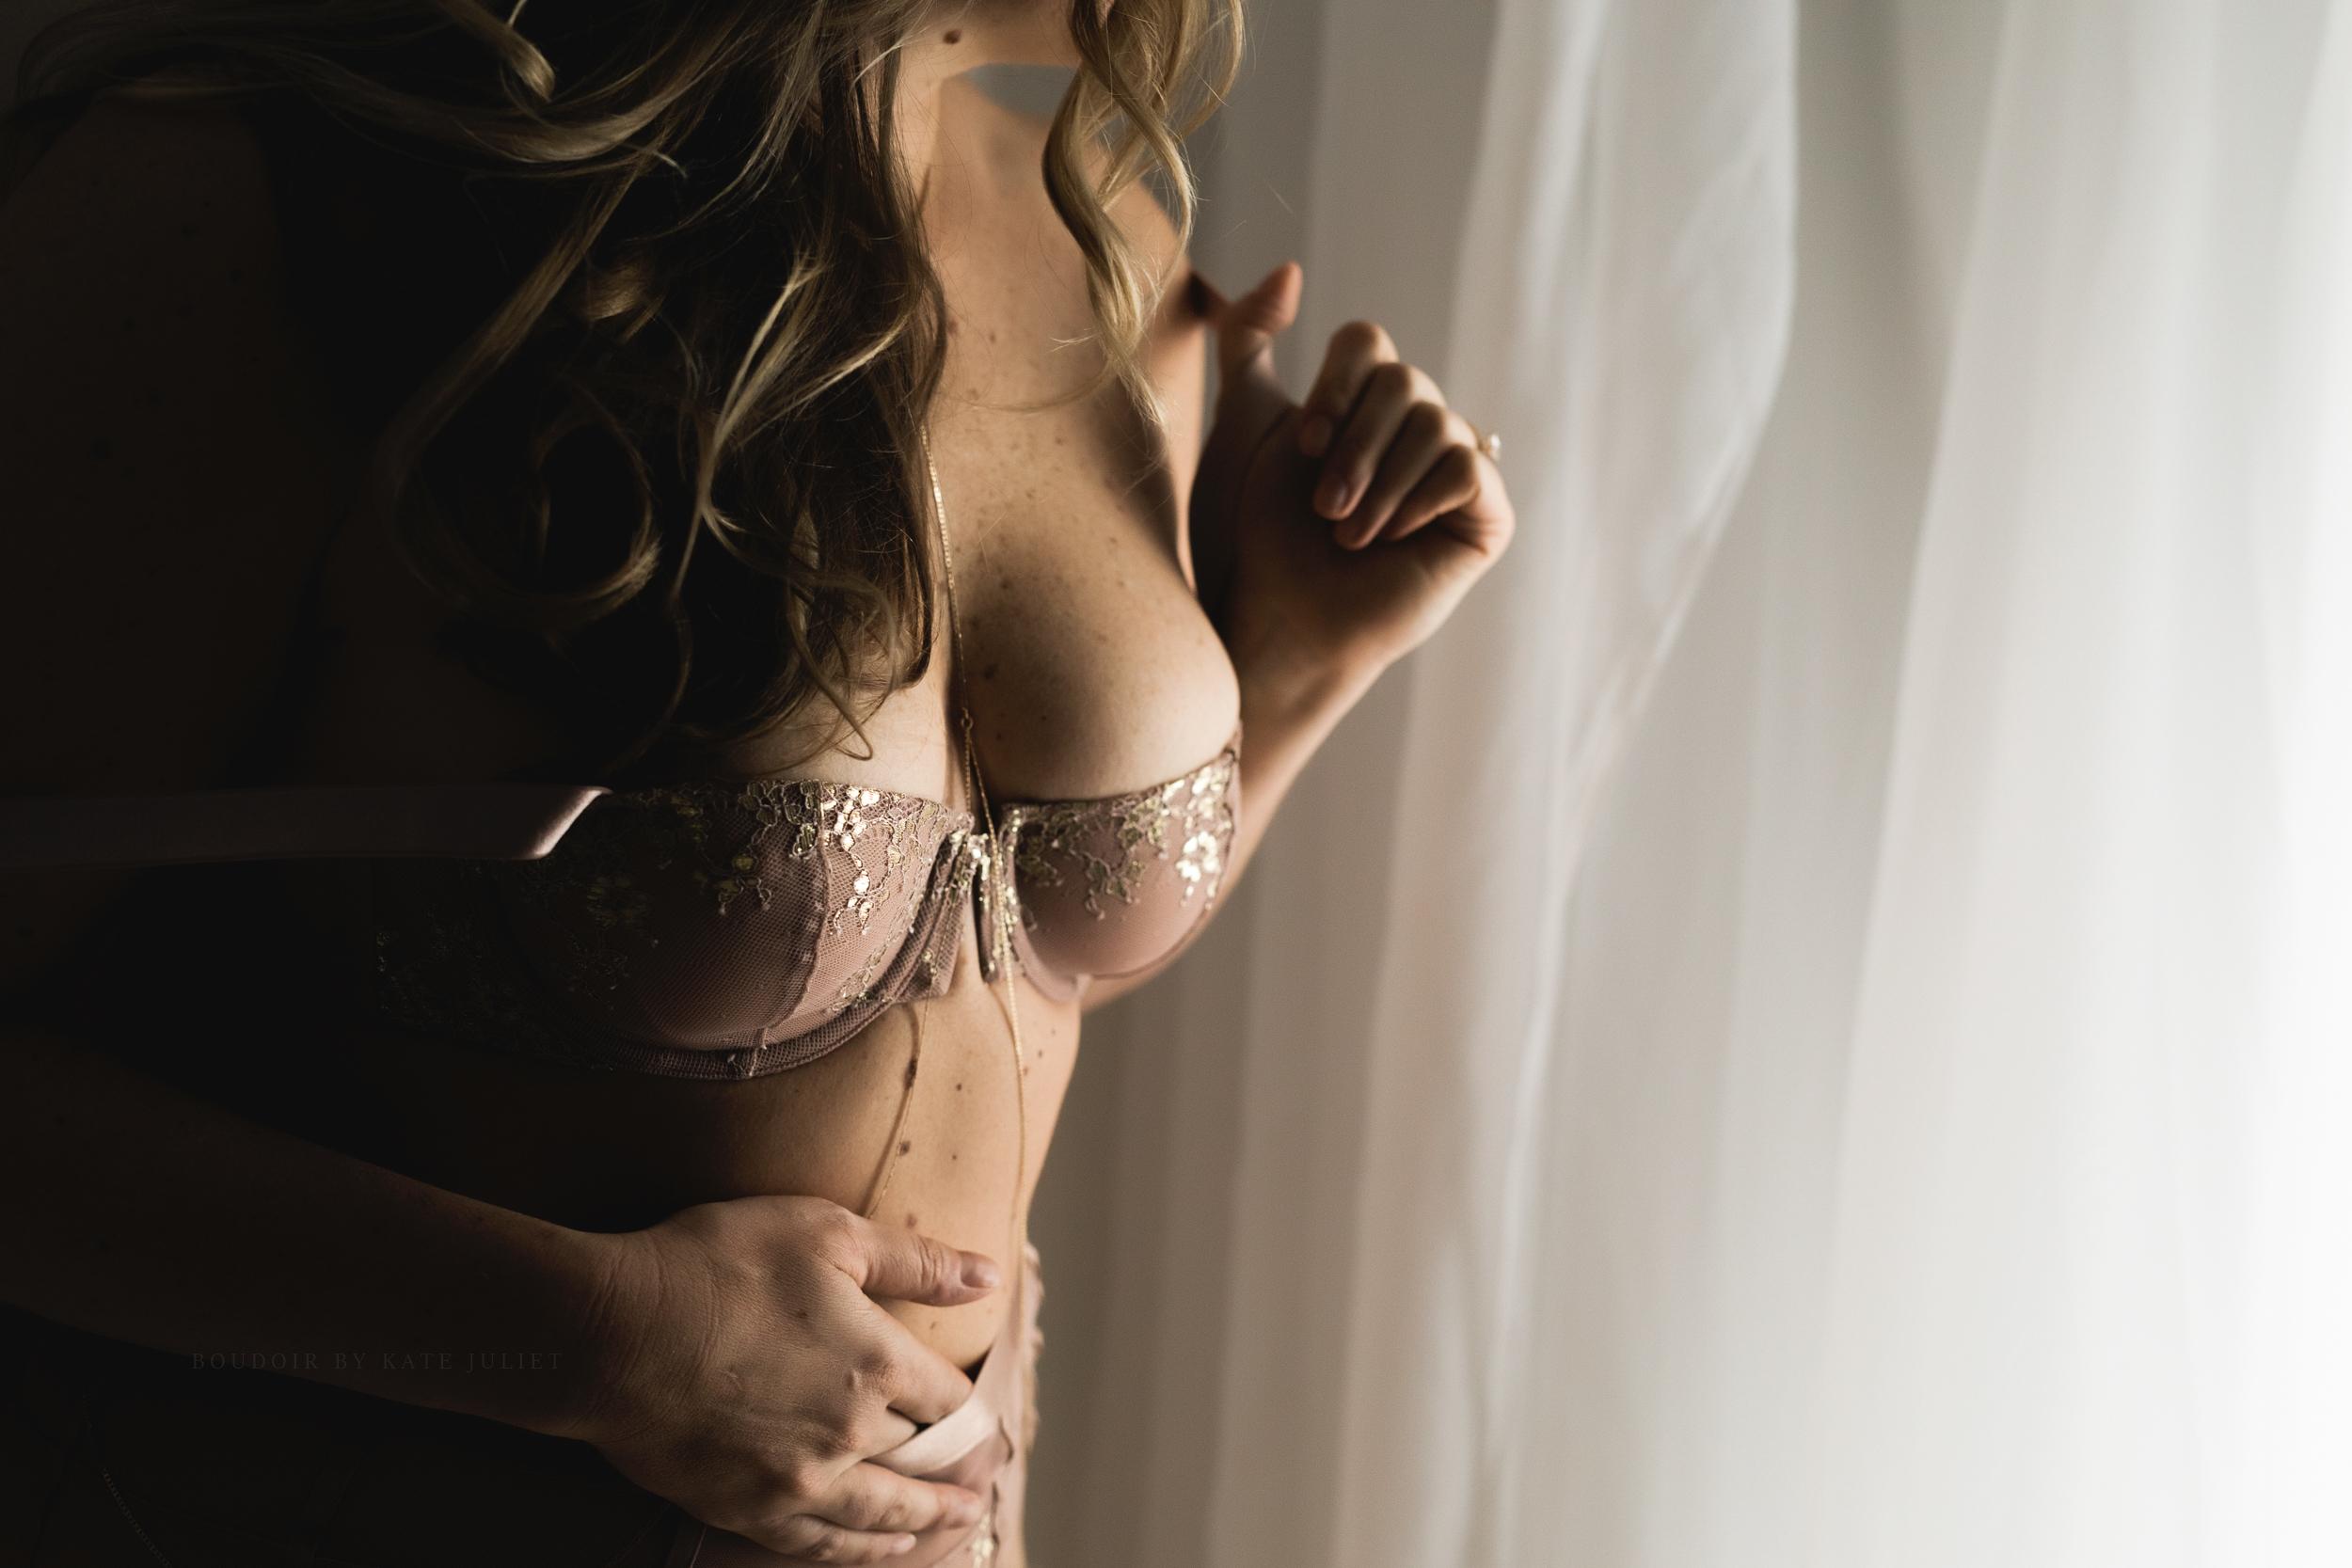 kate_juliet_photography_boudoir_web-1-7.jpg